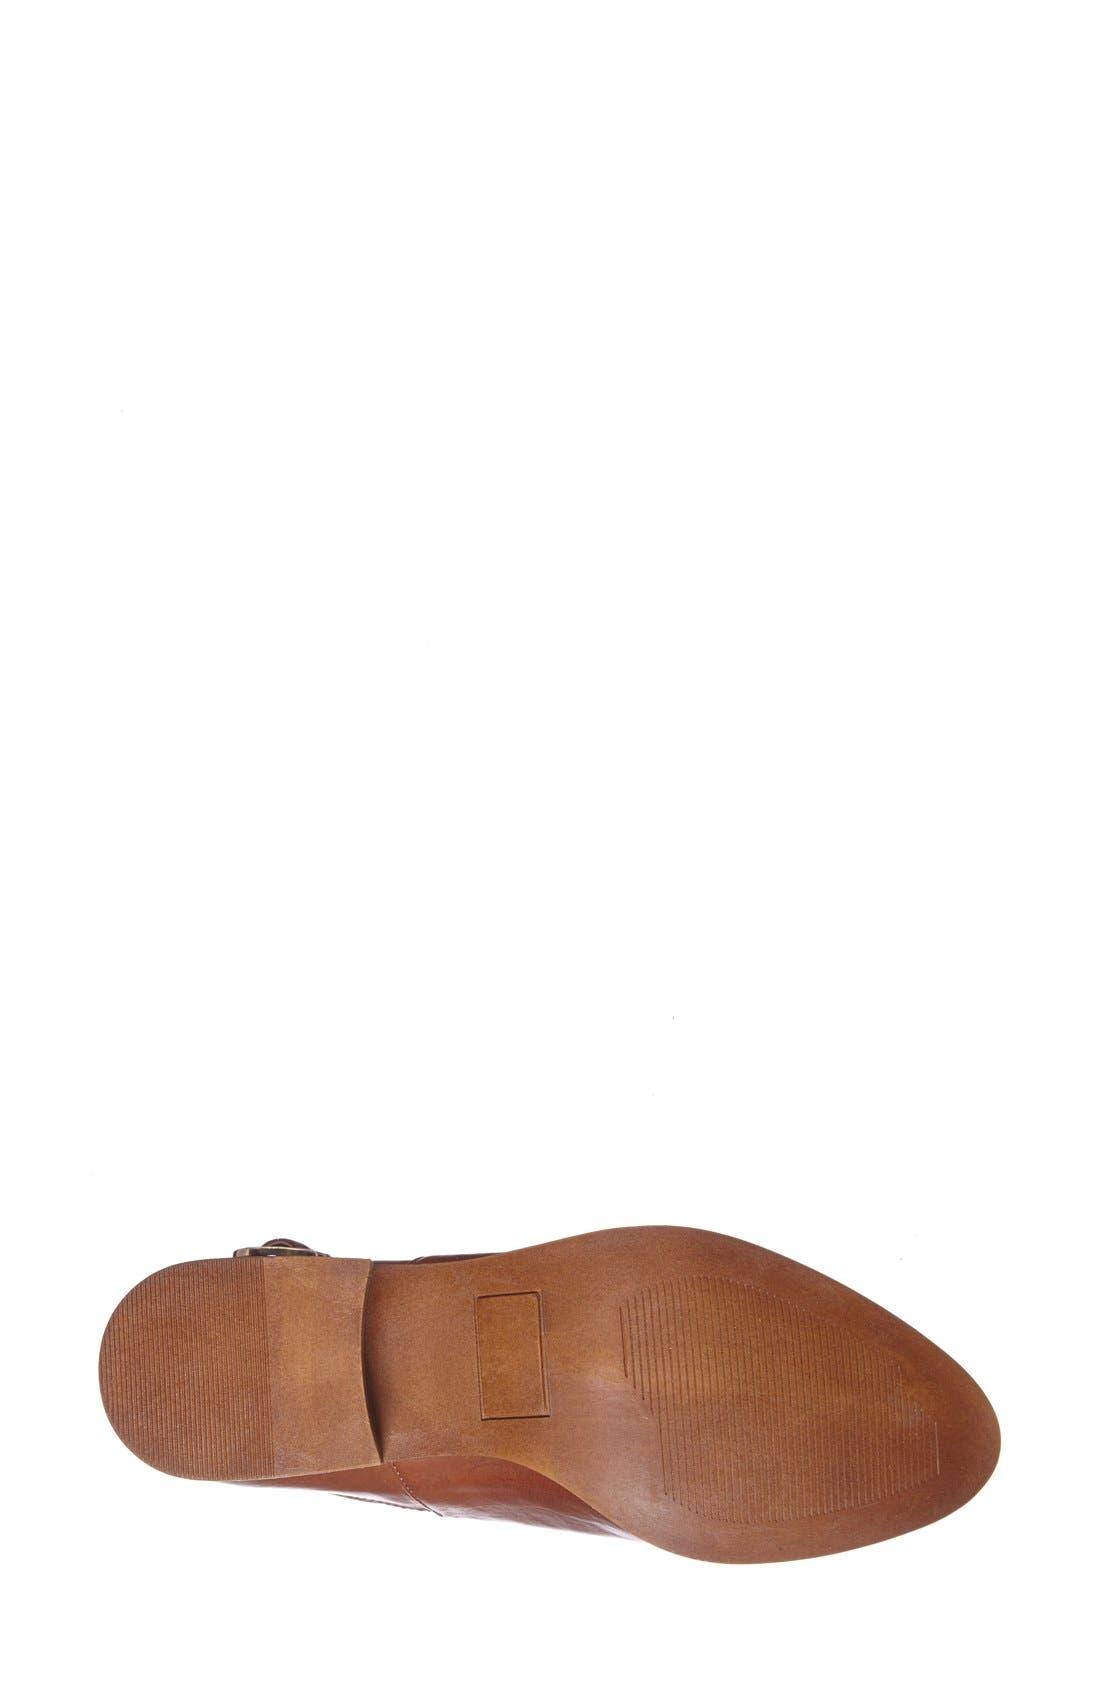 Alternate Image 4  - BC Footwear 'Dress Up' Ankle Bootie (Women)